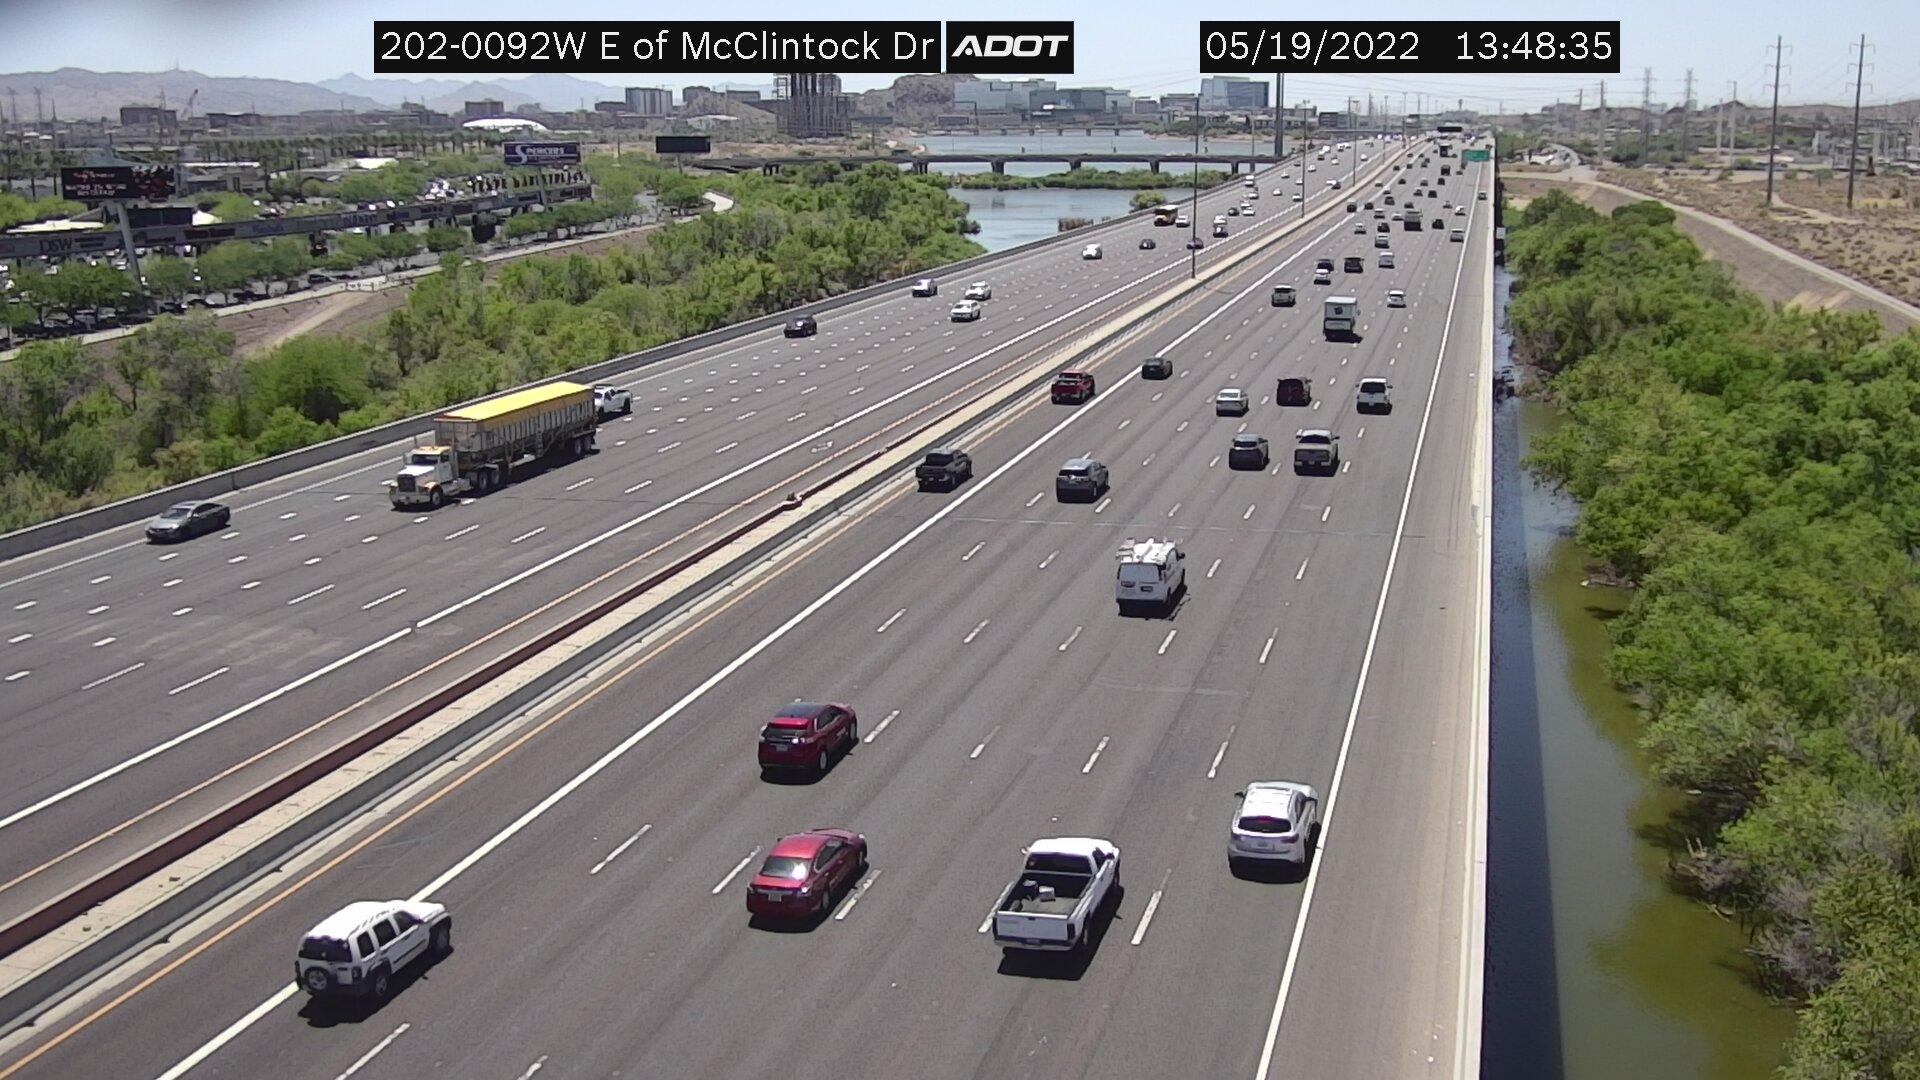 E of McClintock WB (L202) (210) - Phoenix and Arizona